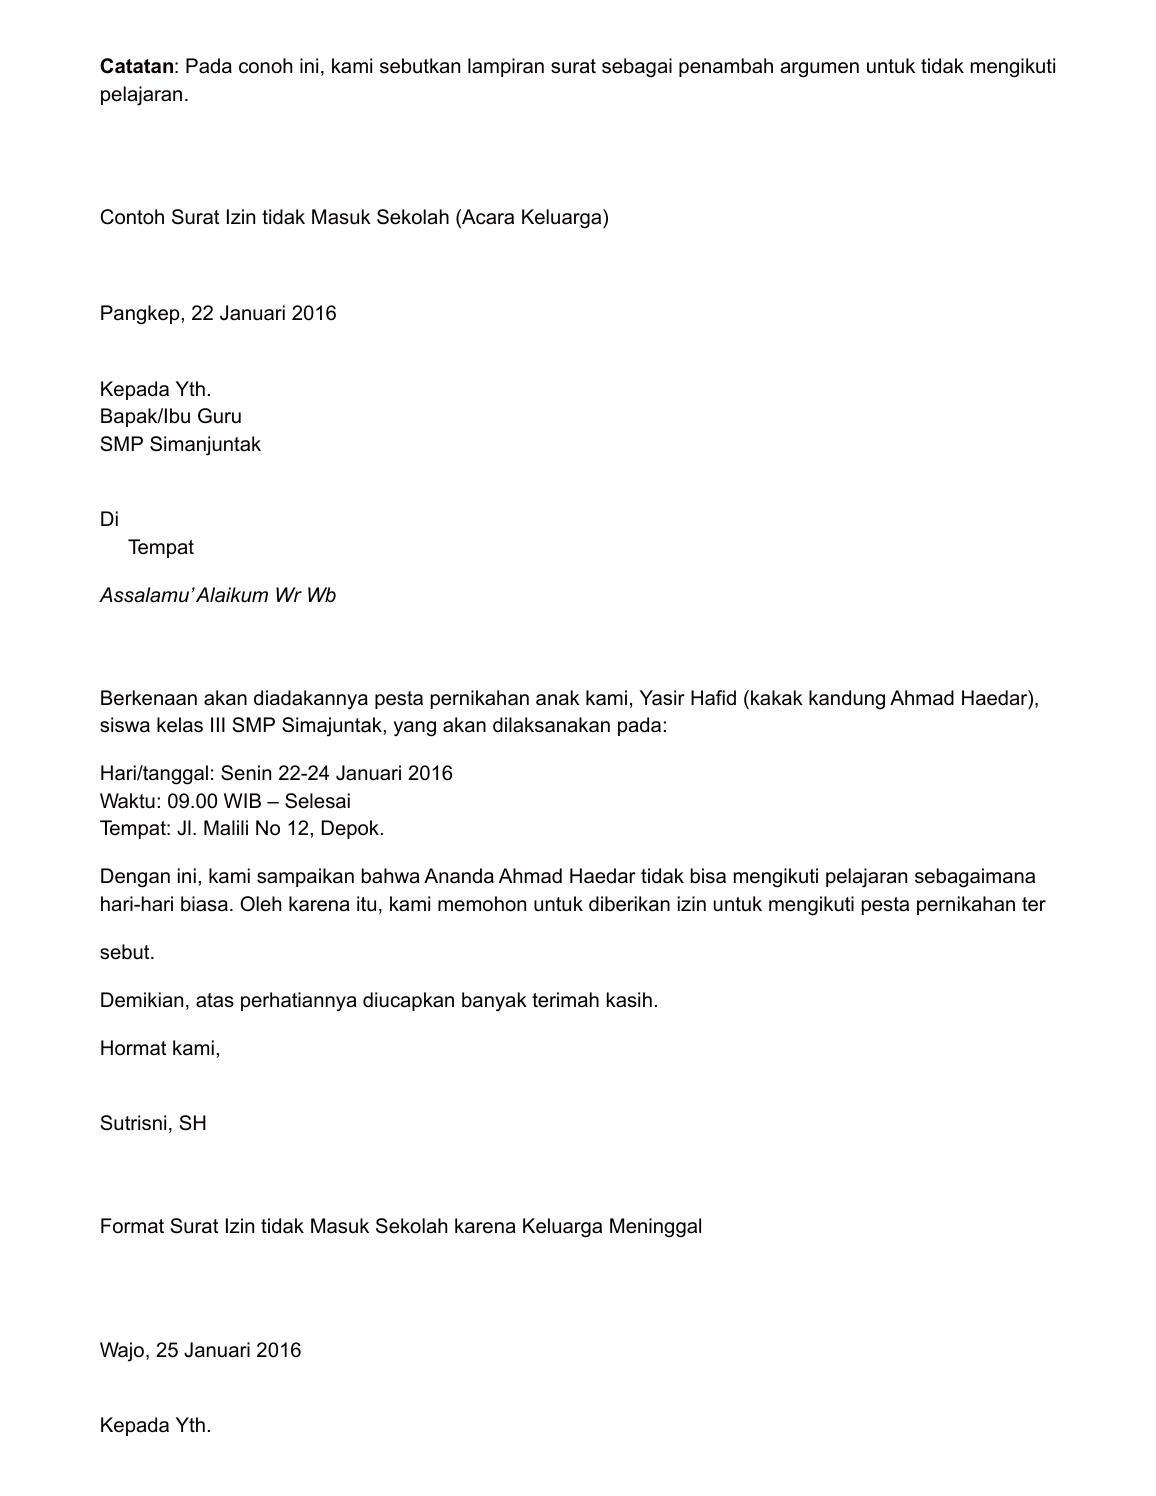 Contoh Surat Izin Sekolah Karena Urusan Keluarga Smp